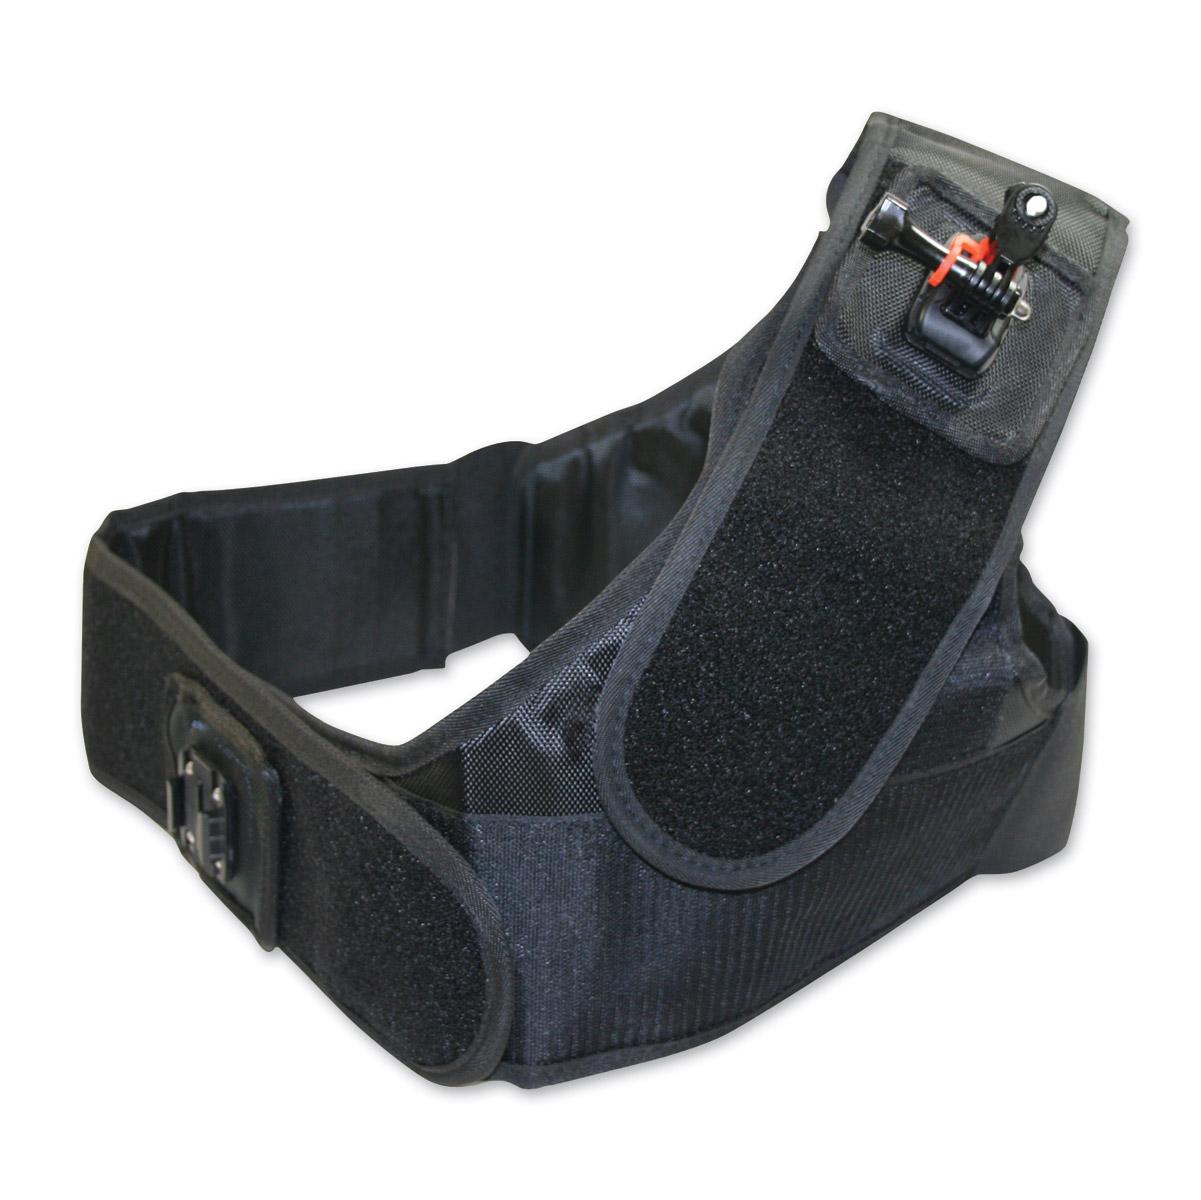 RP Tronix Shoulder Harness Mount